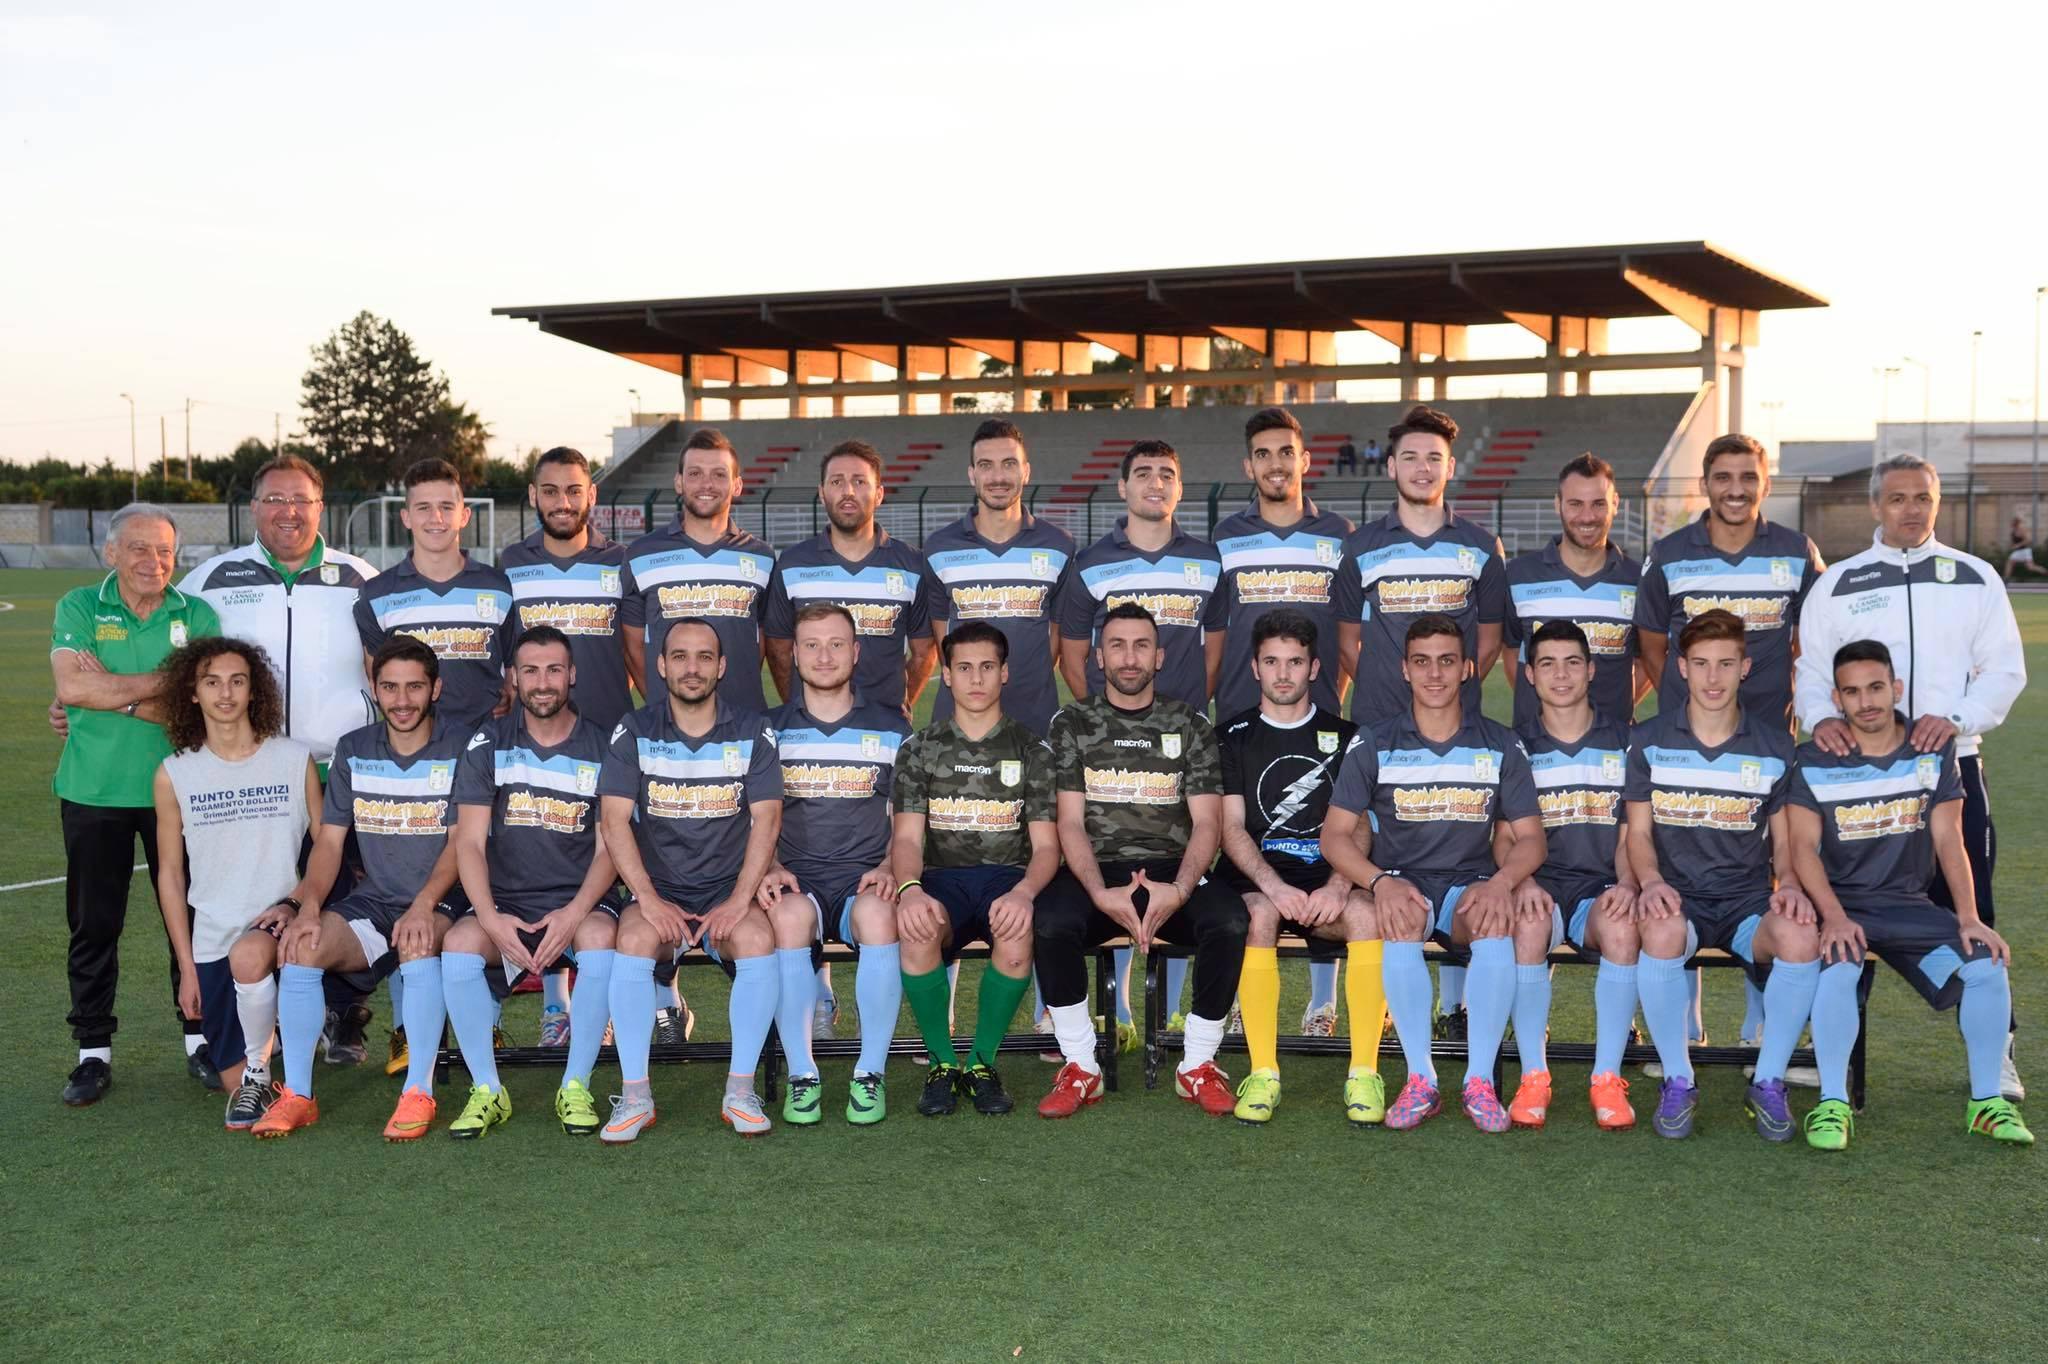 la squadra 2015-16